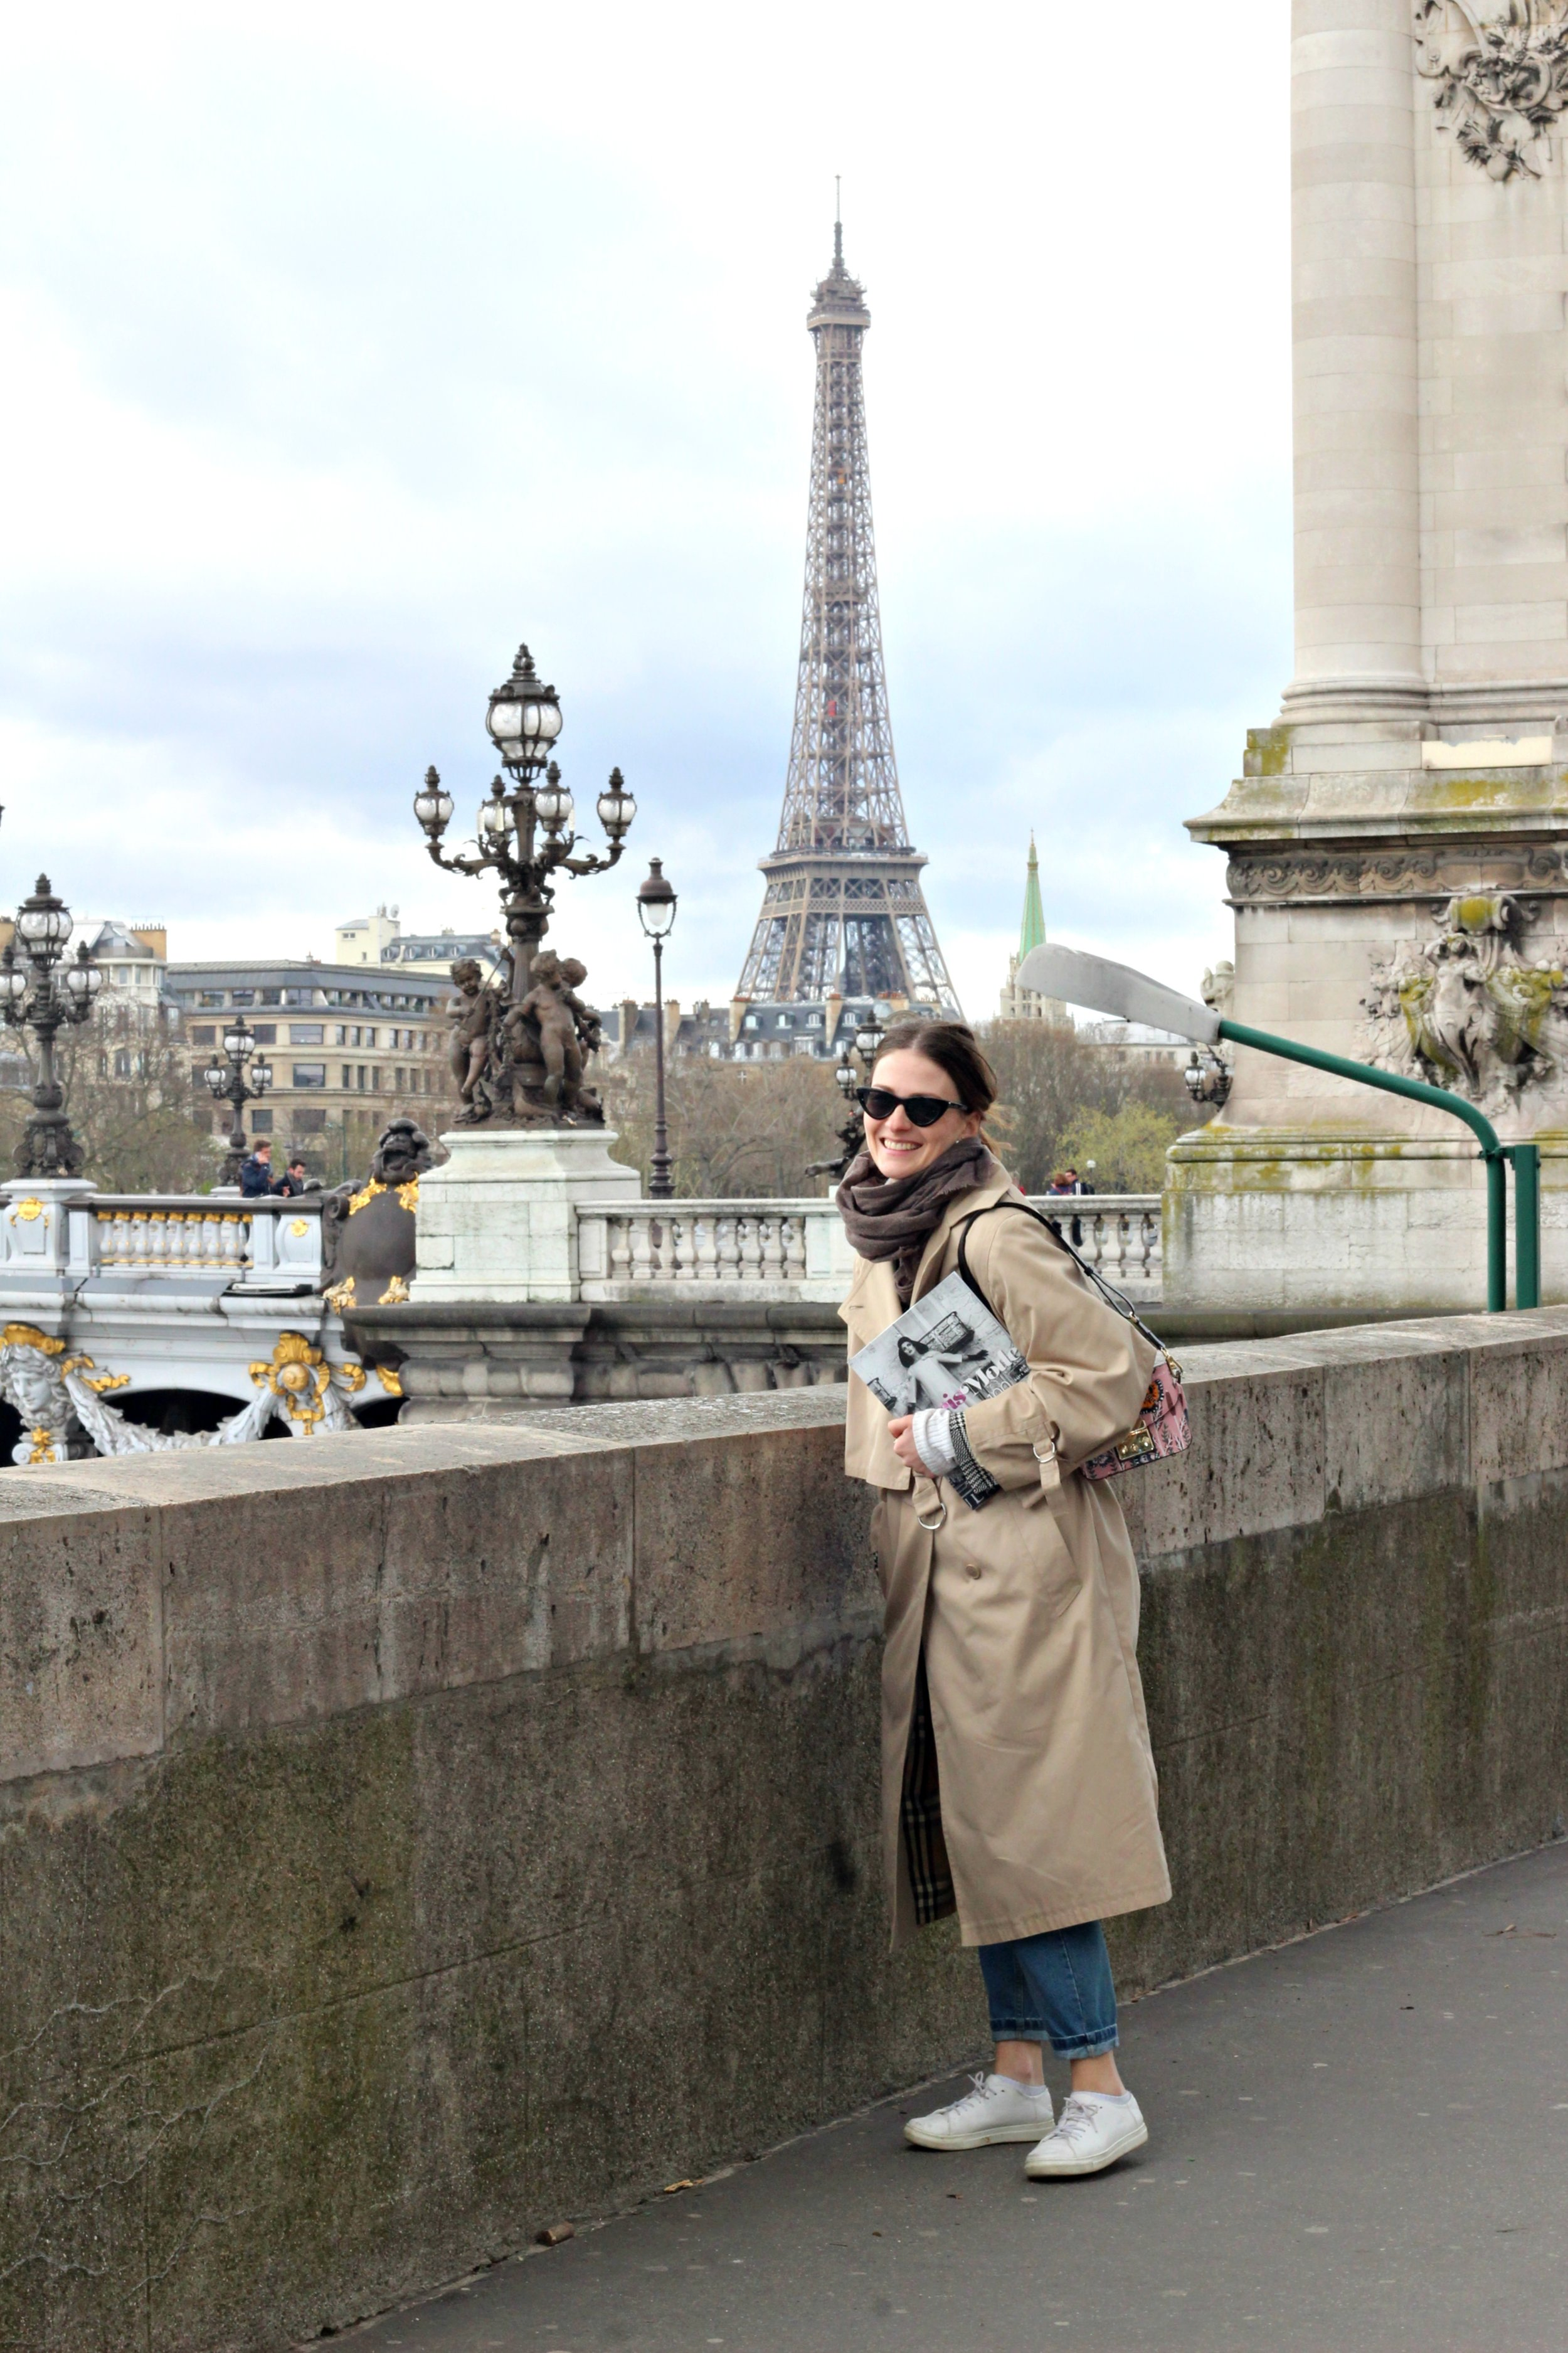 annaporter-paris-travel-guide.jpg